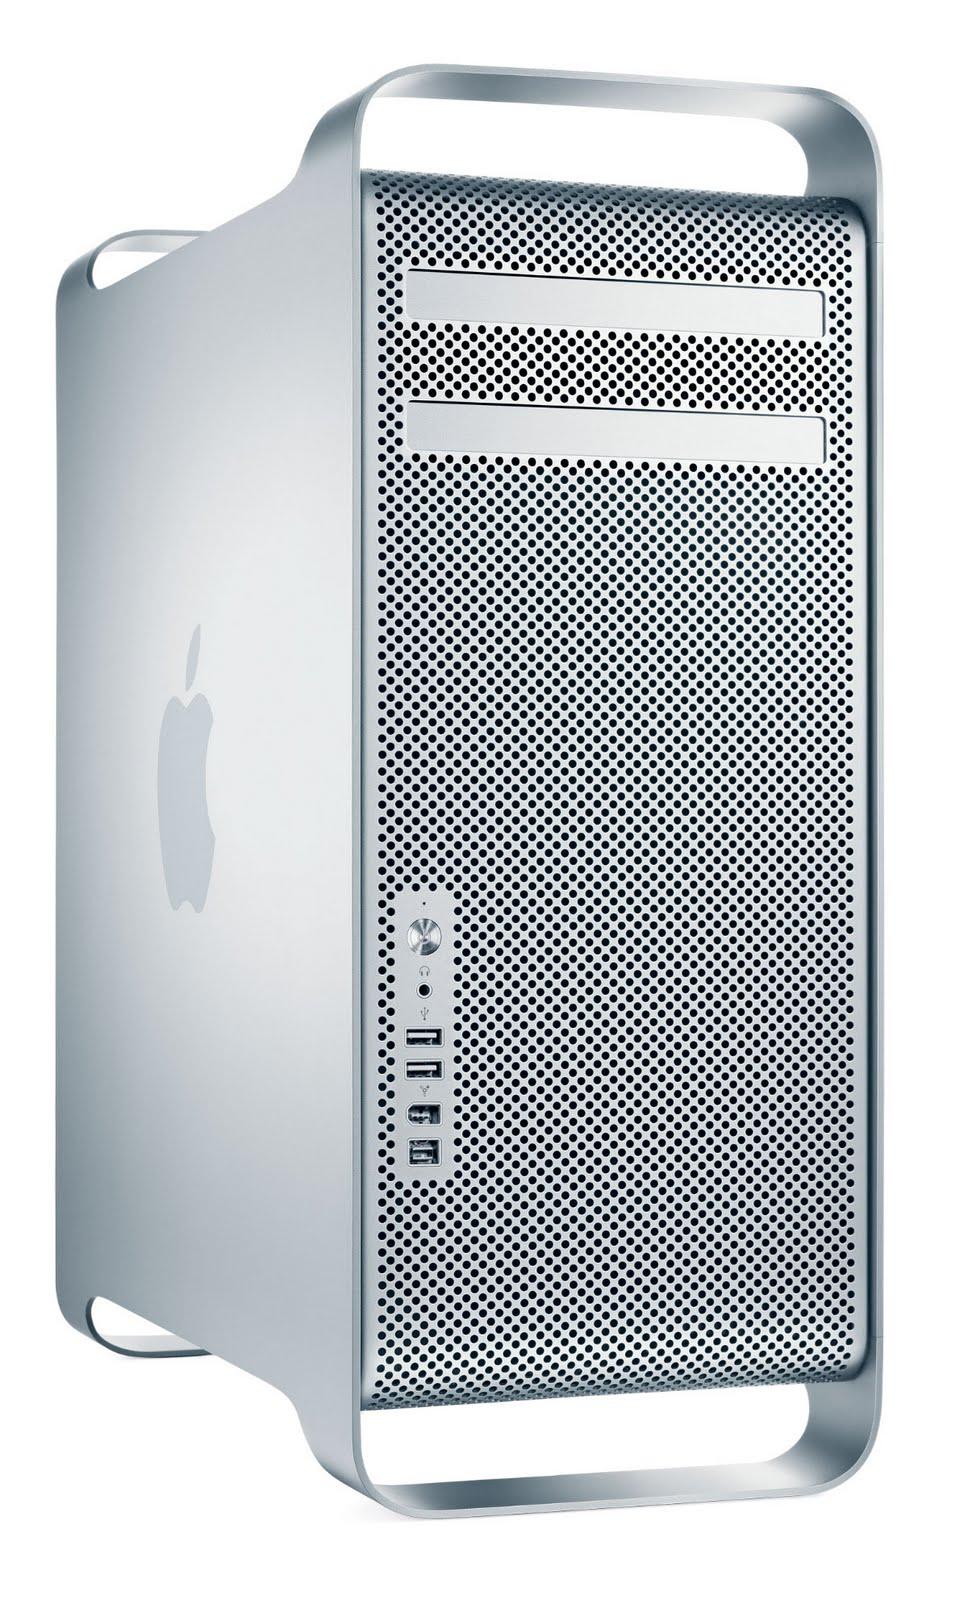 Apple Computer Repair + Support